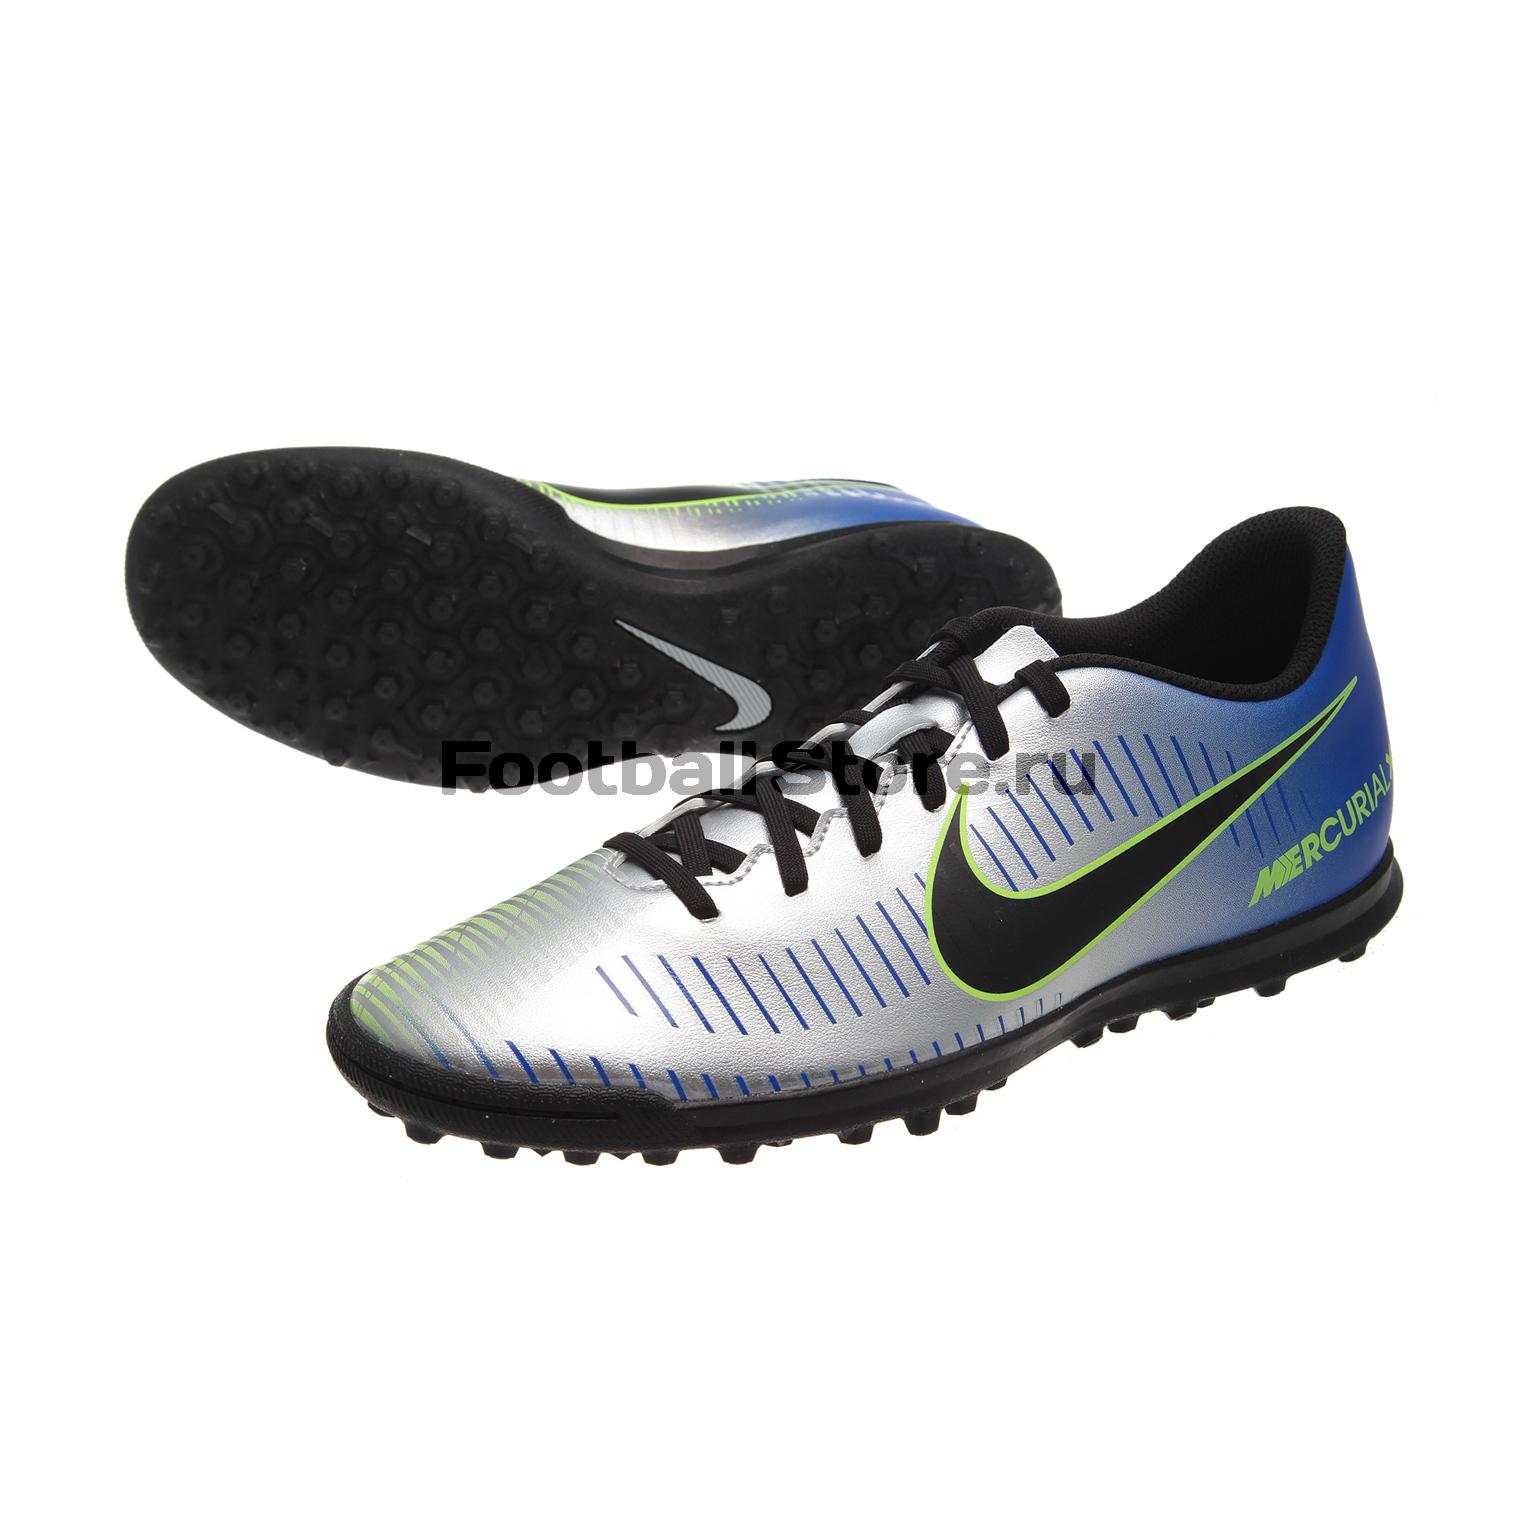 Шиповки Nike Шиповки Nike Mercurial Victory VI Neymar TF 921517-407 quying laptop lcd screen for acer aspire f5 572 r7 572 f5 571 e5 574g e5 571 e1 572 series 15 6 inch 1920x1080 30pin